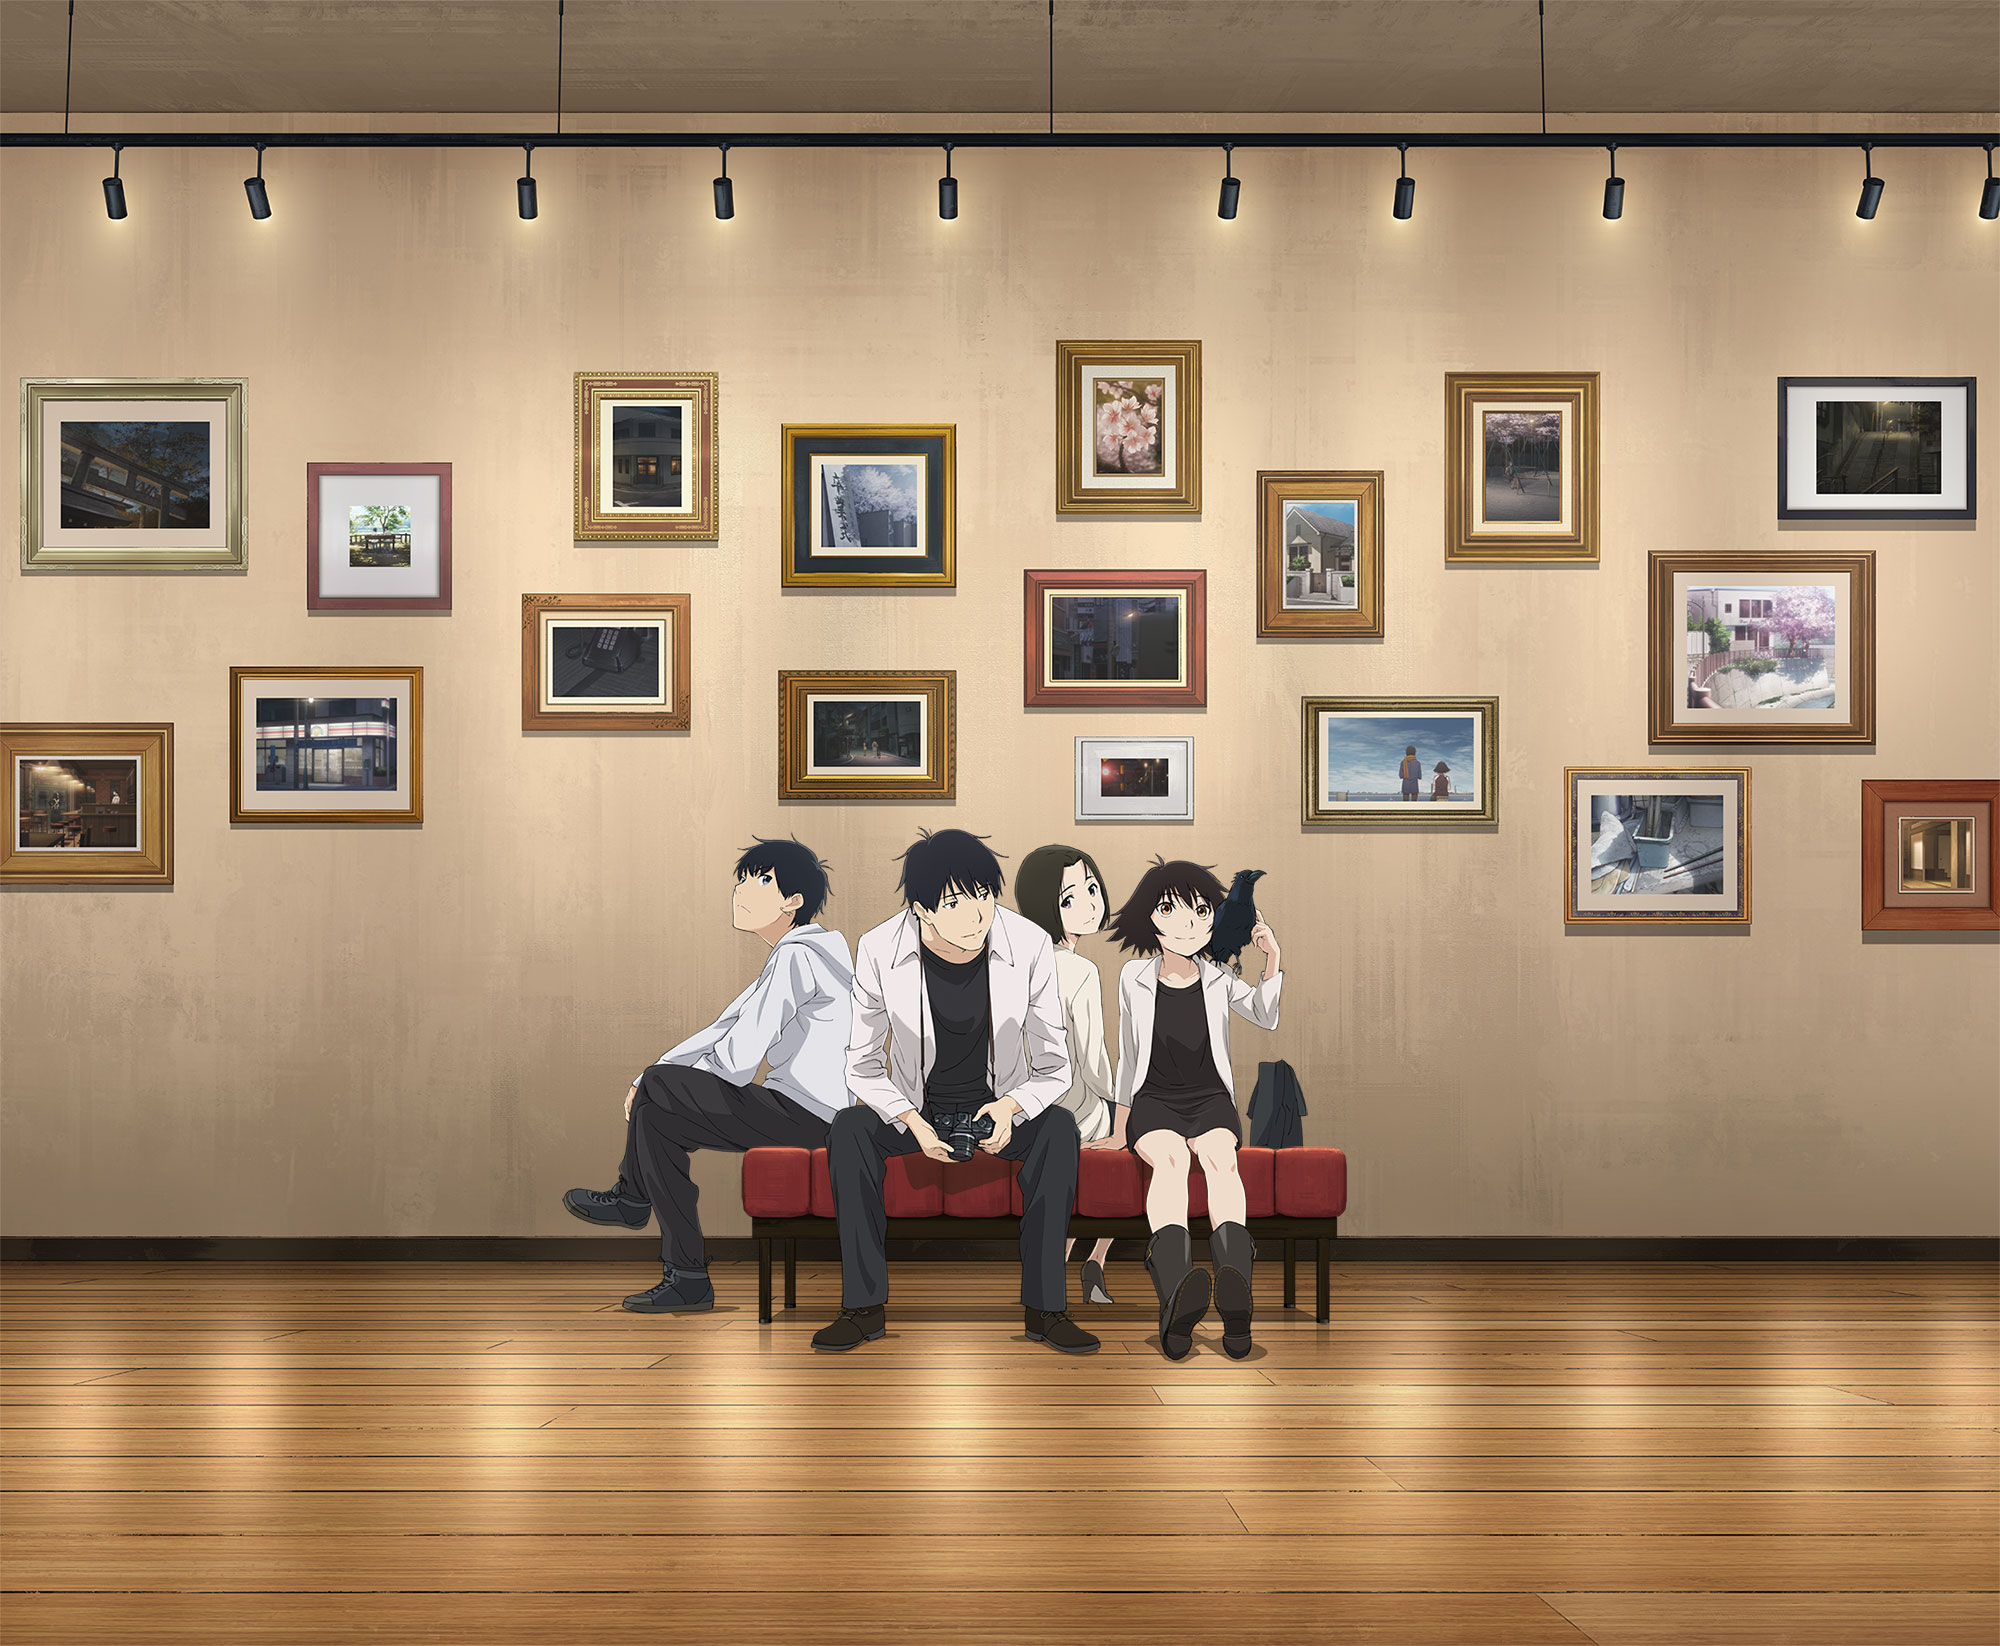 Yesterday wo Utatte (Sing Yesterday For Me) - Zerochan Anime Image ...